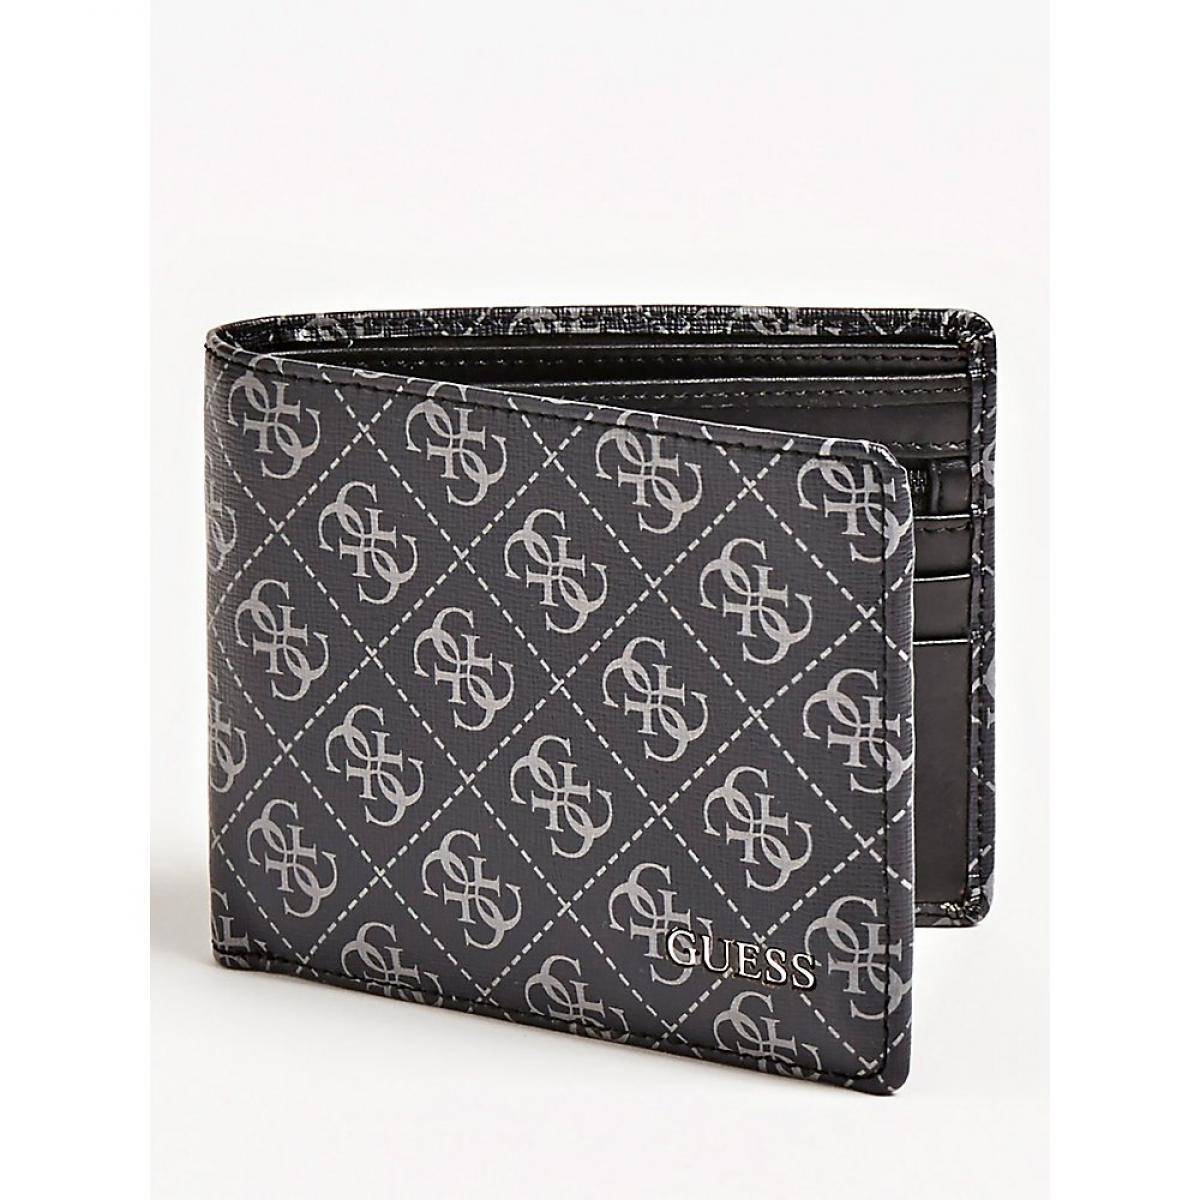 Portefeuille avec porte monnaie Manhattan logo Plus d'infos